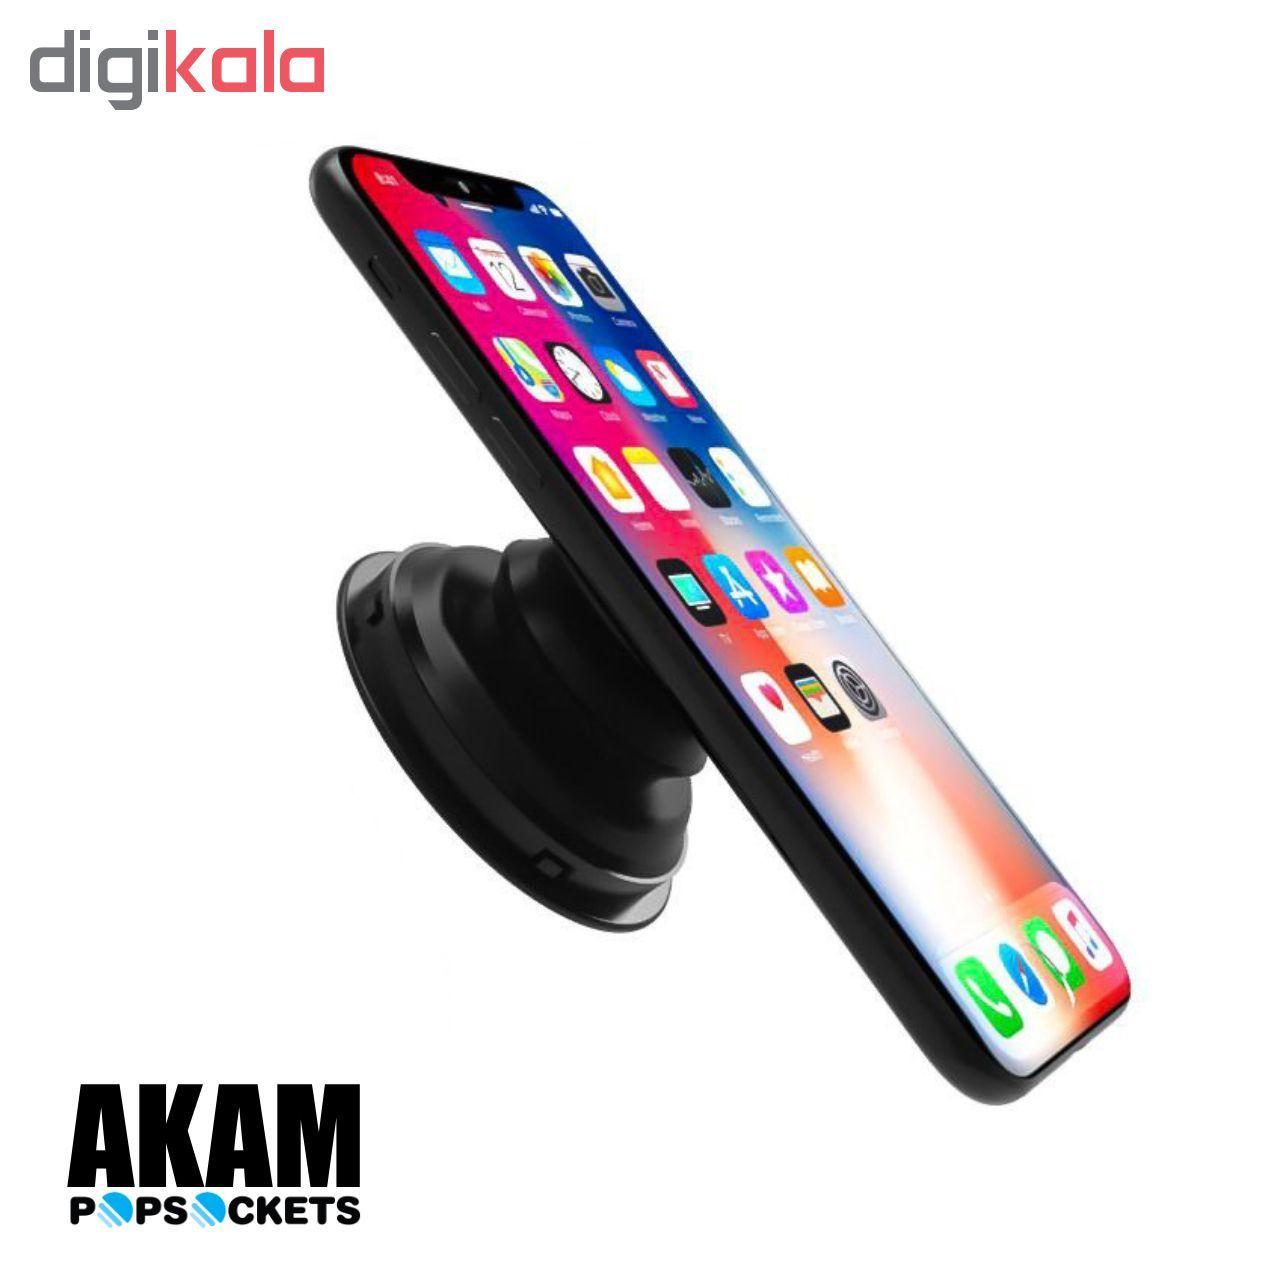 پایه نگهدارنده گوشی موبایل پاپ سوکت آکام مدل APS0101 main 1 8